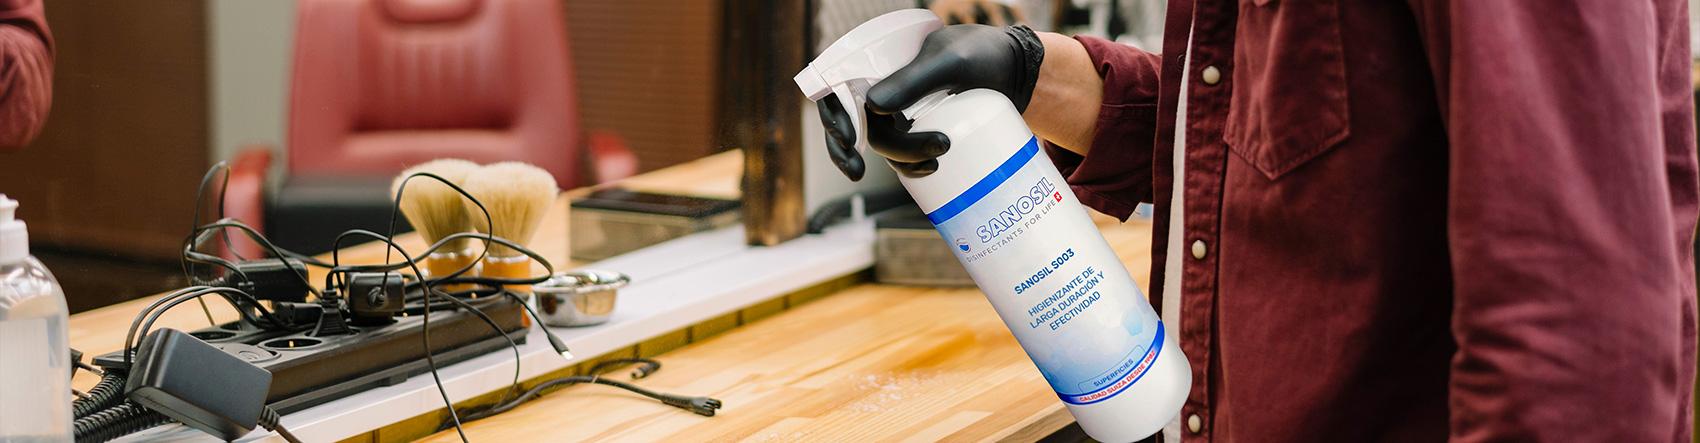 higienizante de superficies - slide